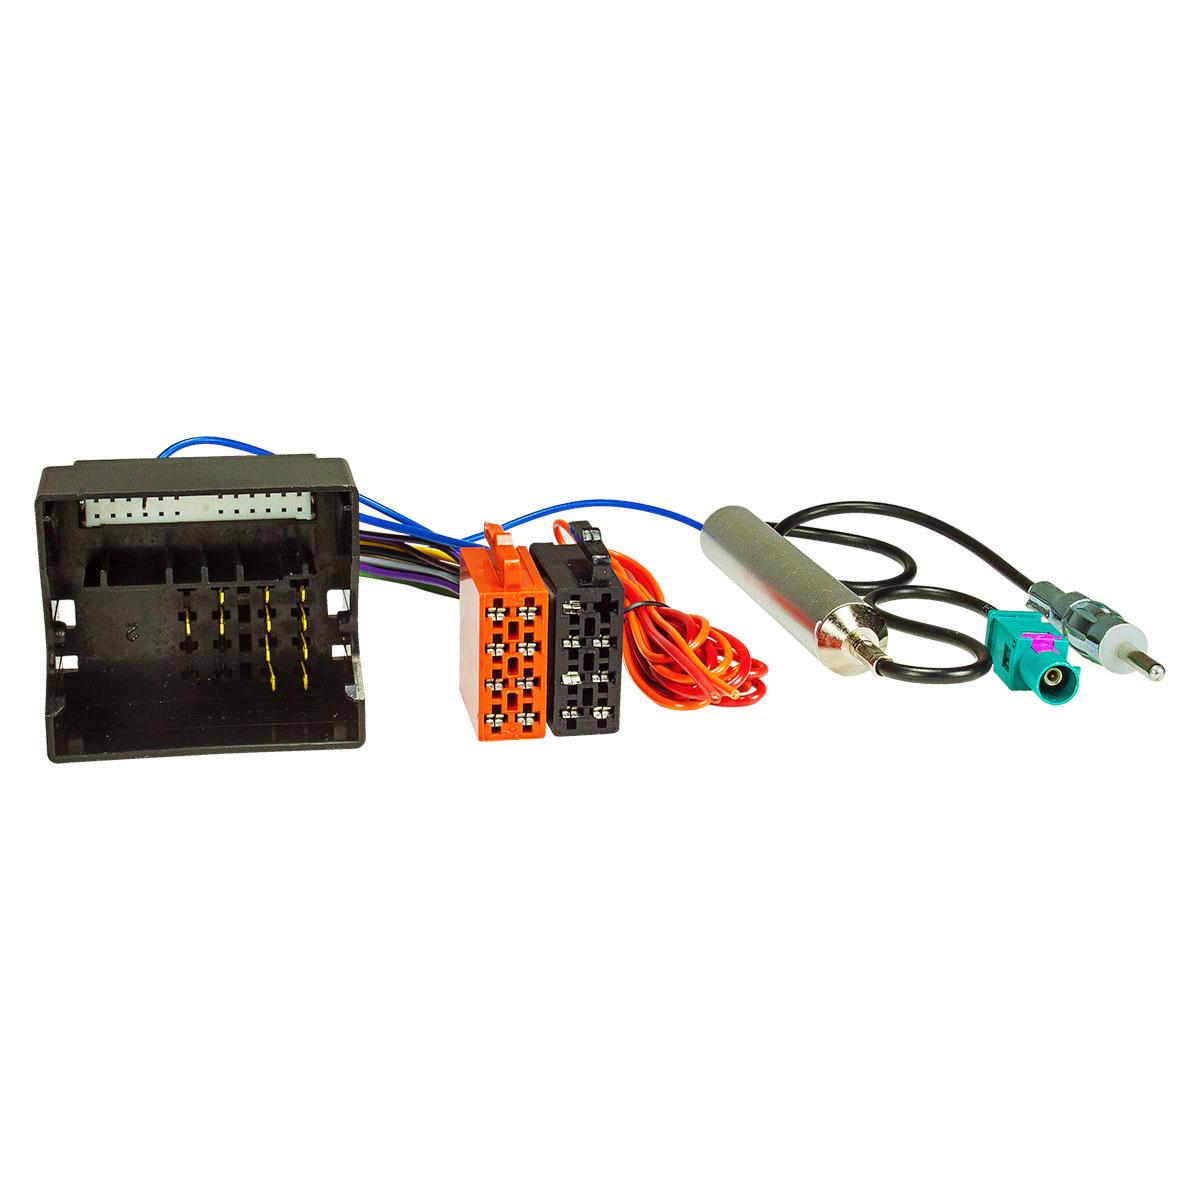 Radio Blende Adapter Kabel für OPEL Agila Corsa Meriva Vectra Zafira Schwarz